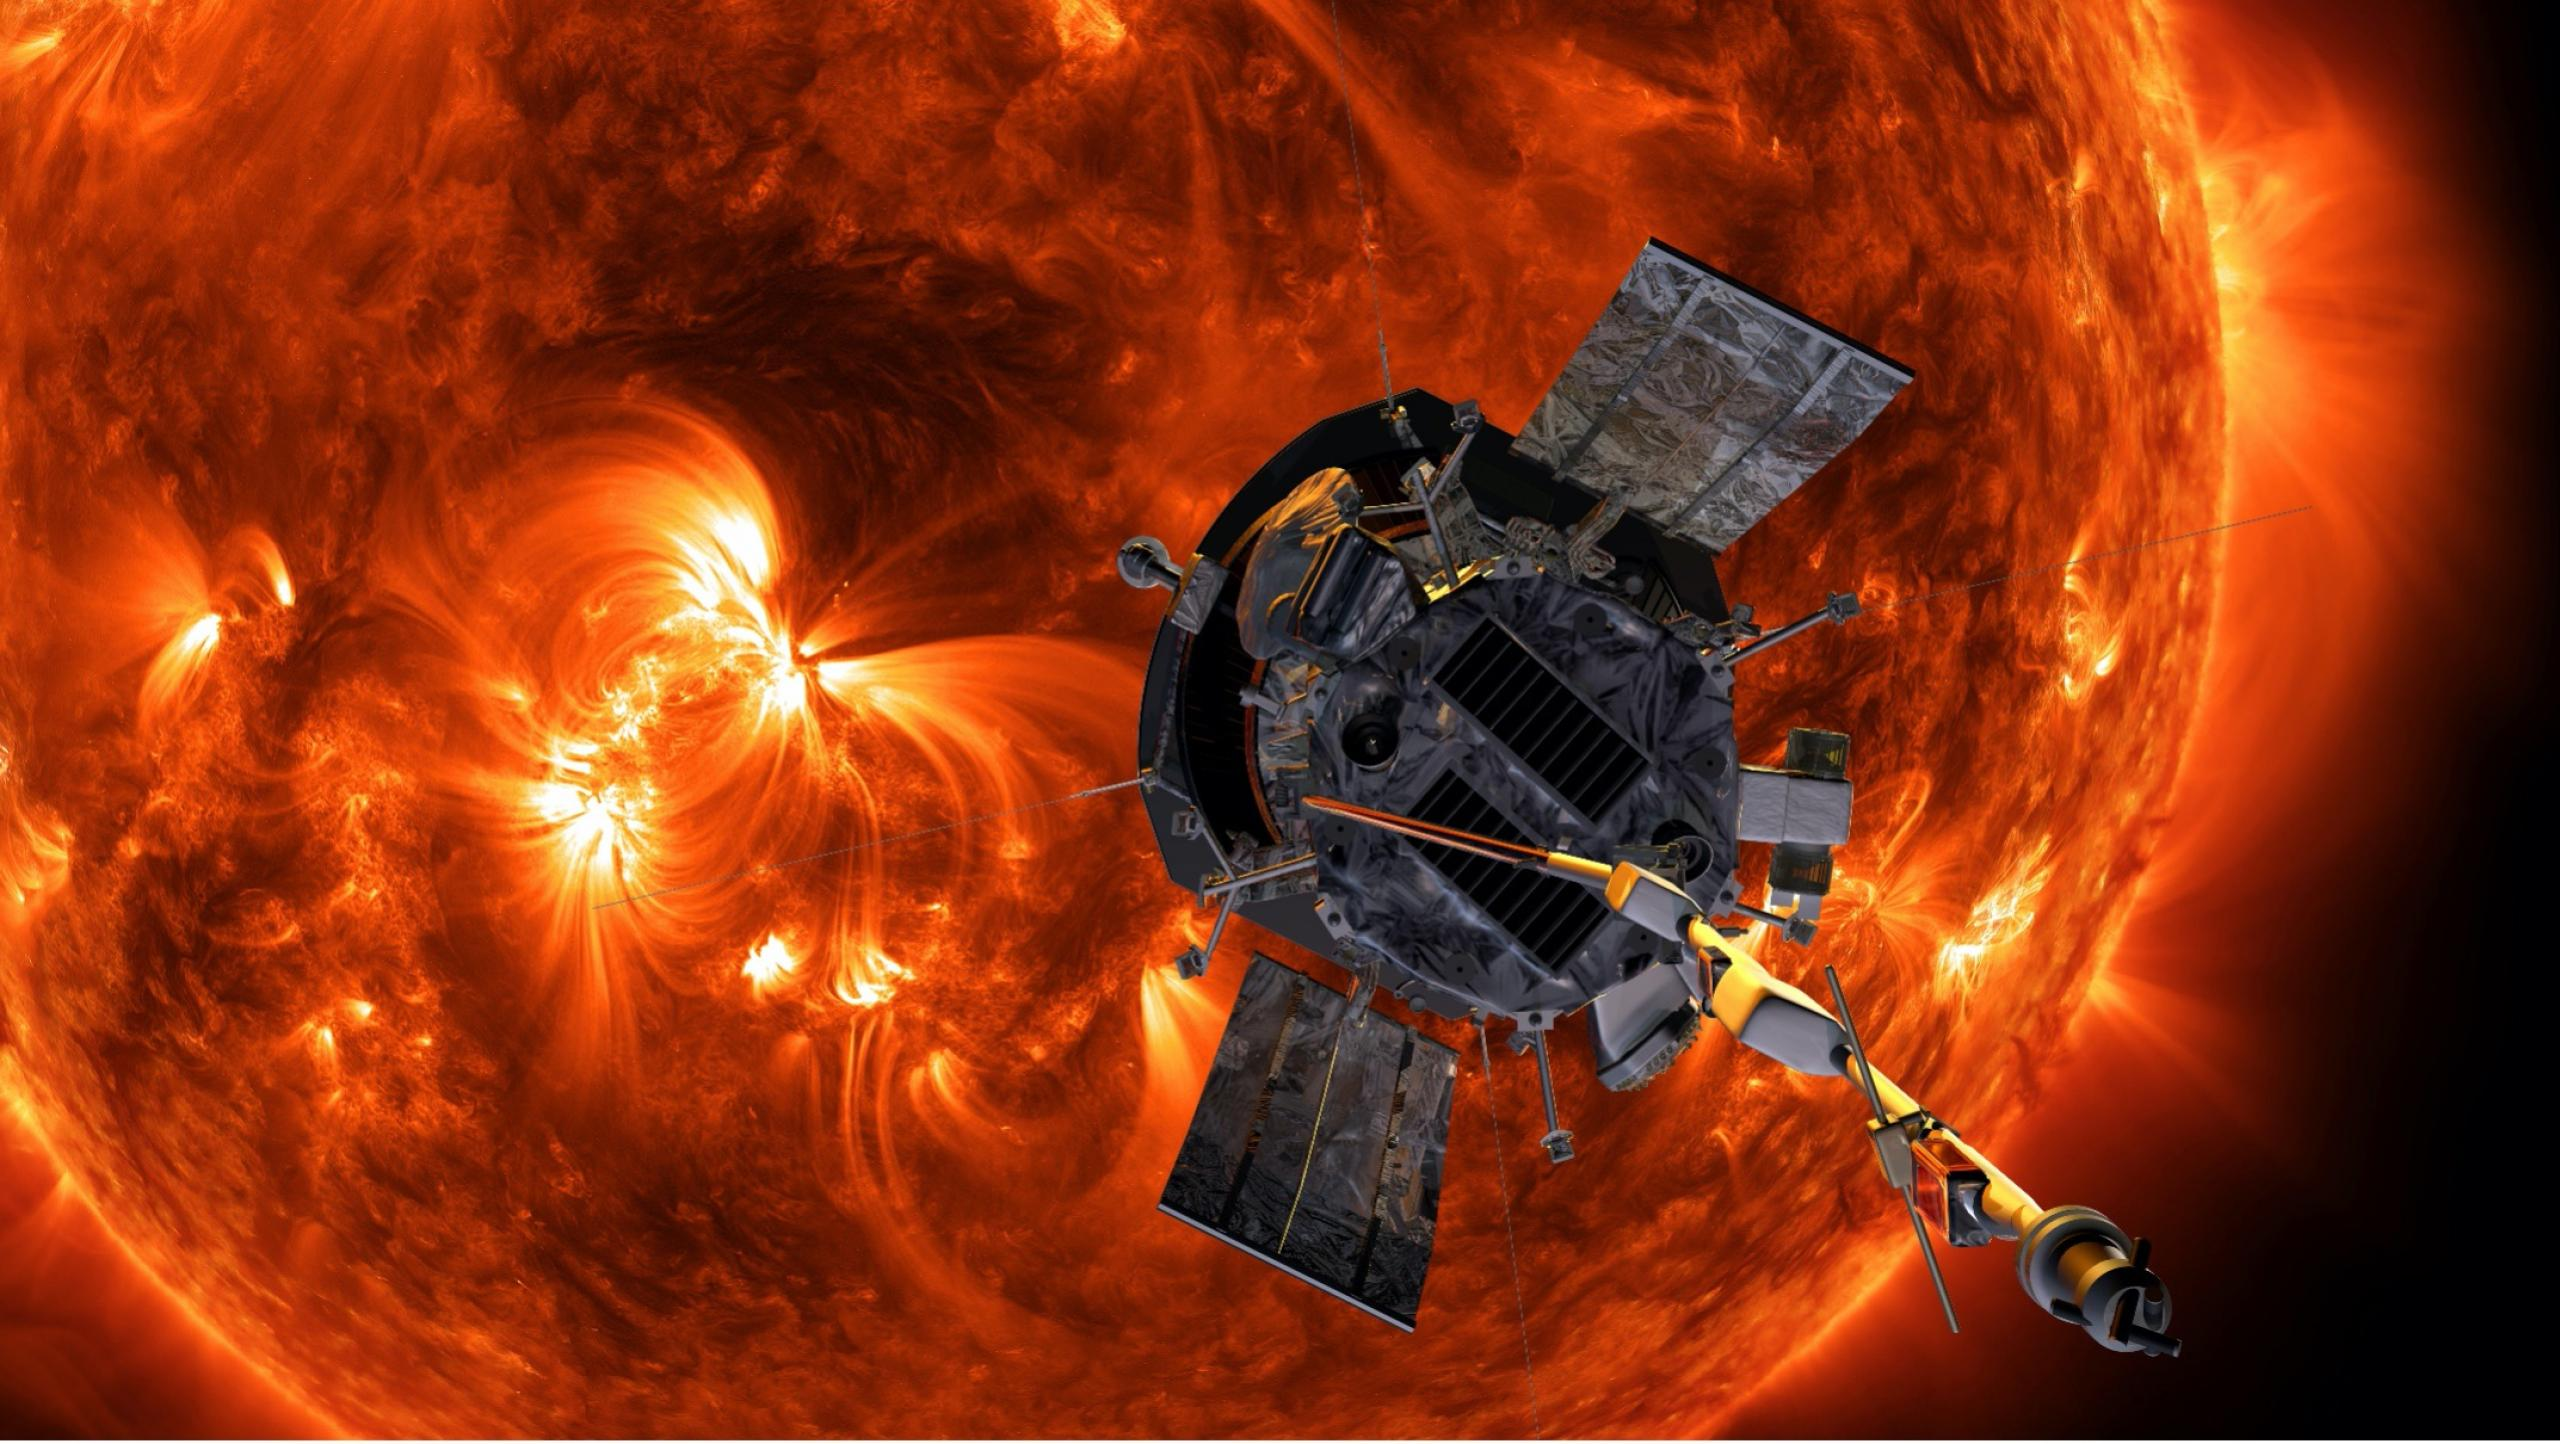 Artist concept of spacecraft in front of orange sun.